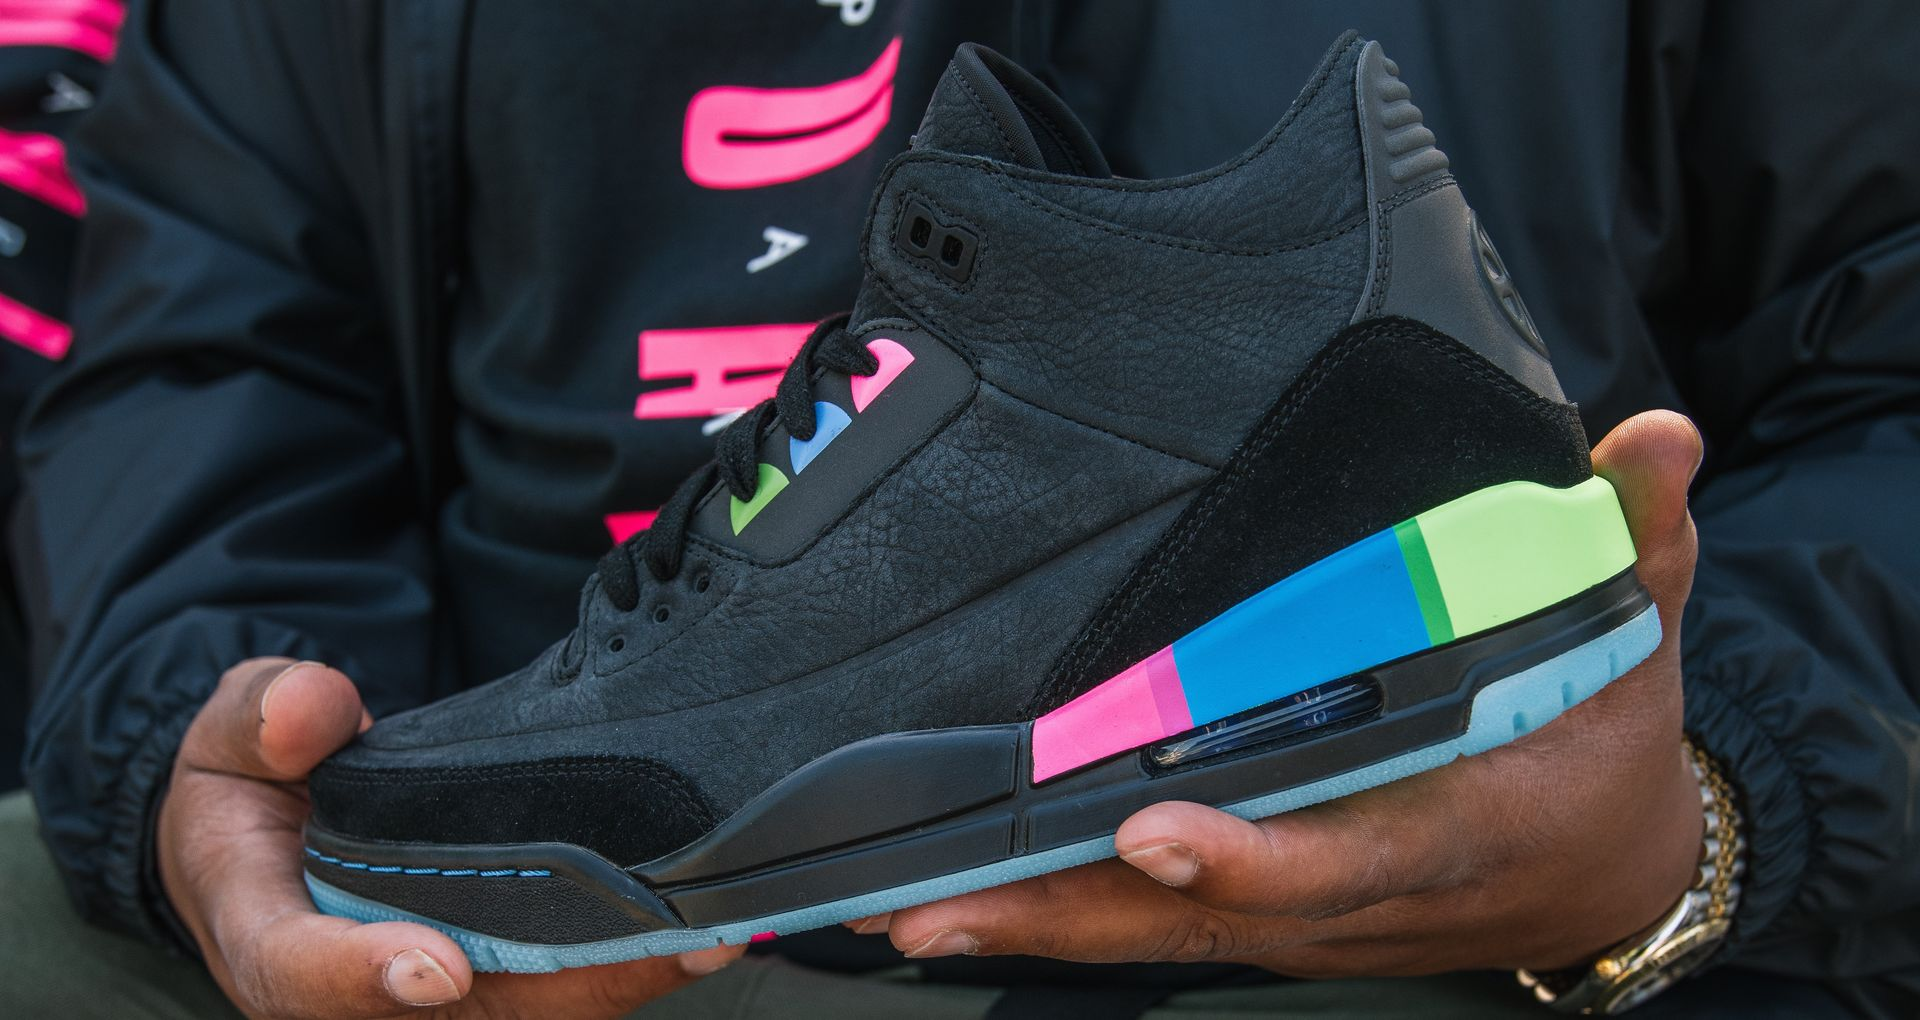 b542f6a67857d9 air-jordan-3-retro-quai-54-release-date - Sneaker Myth